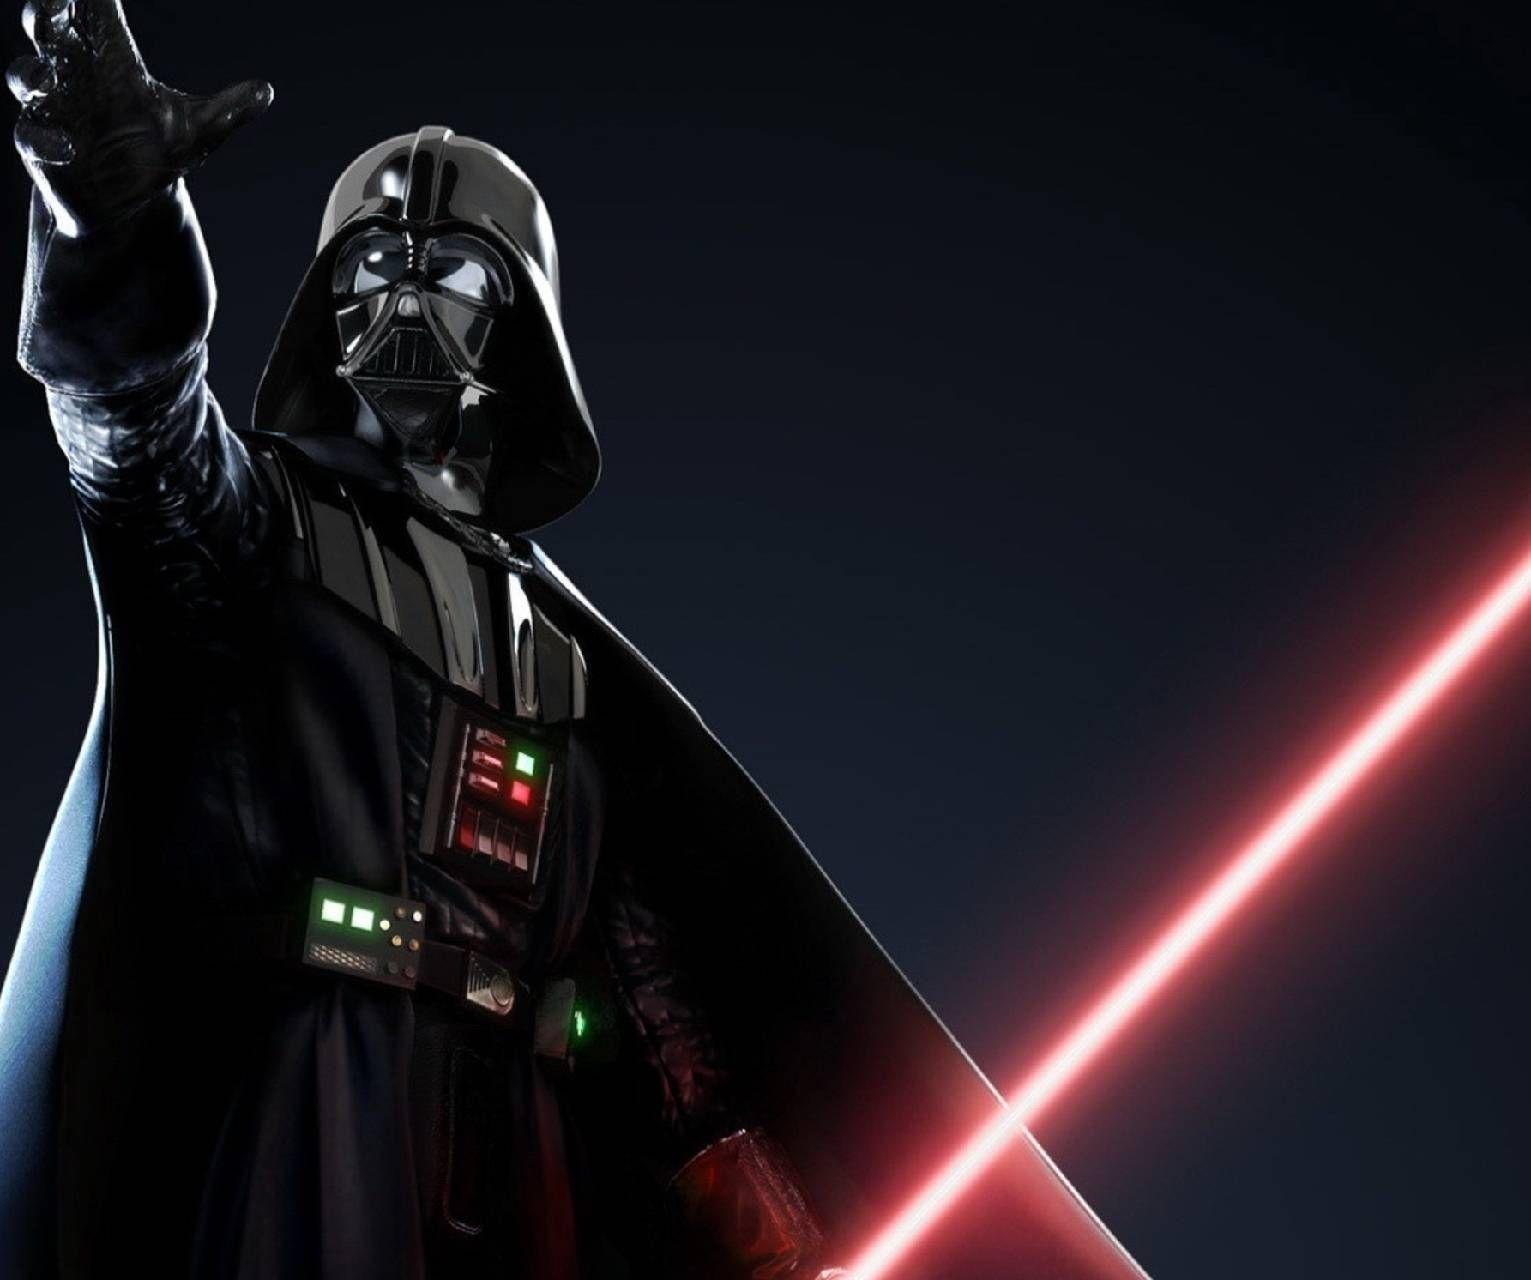 Download Darth Vader Wallpaper By BritishPatriot